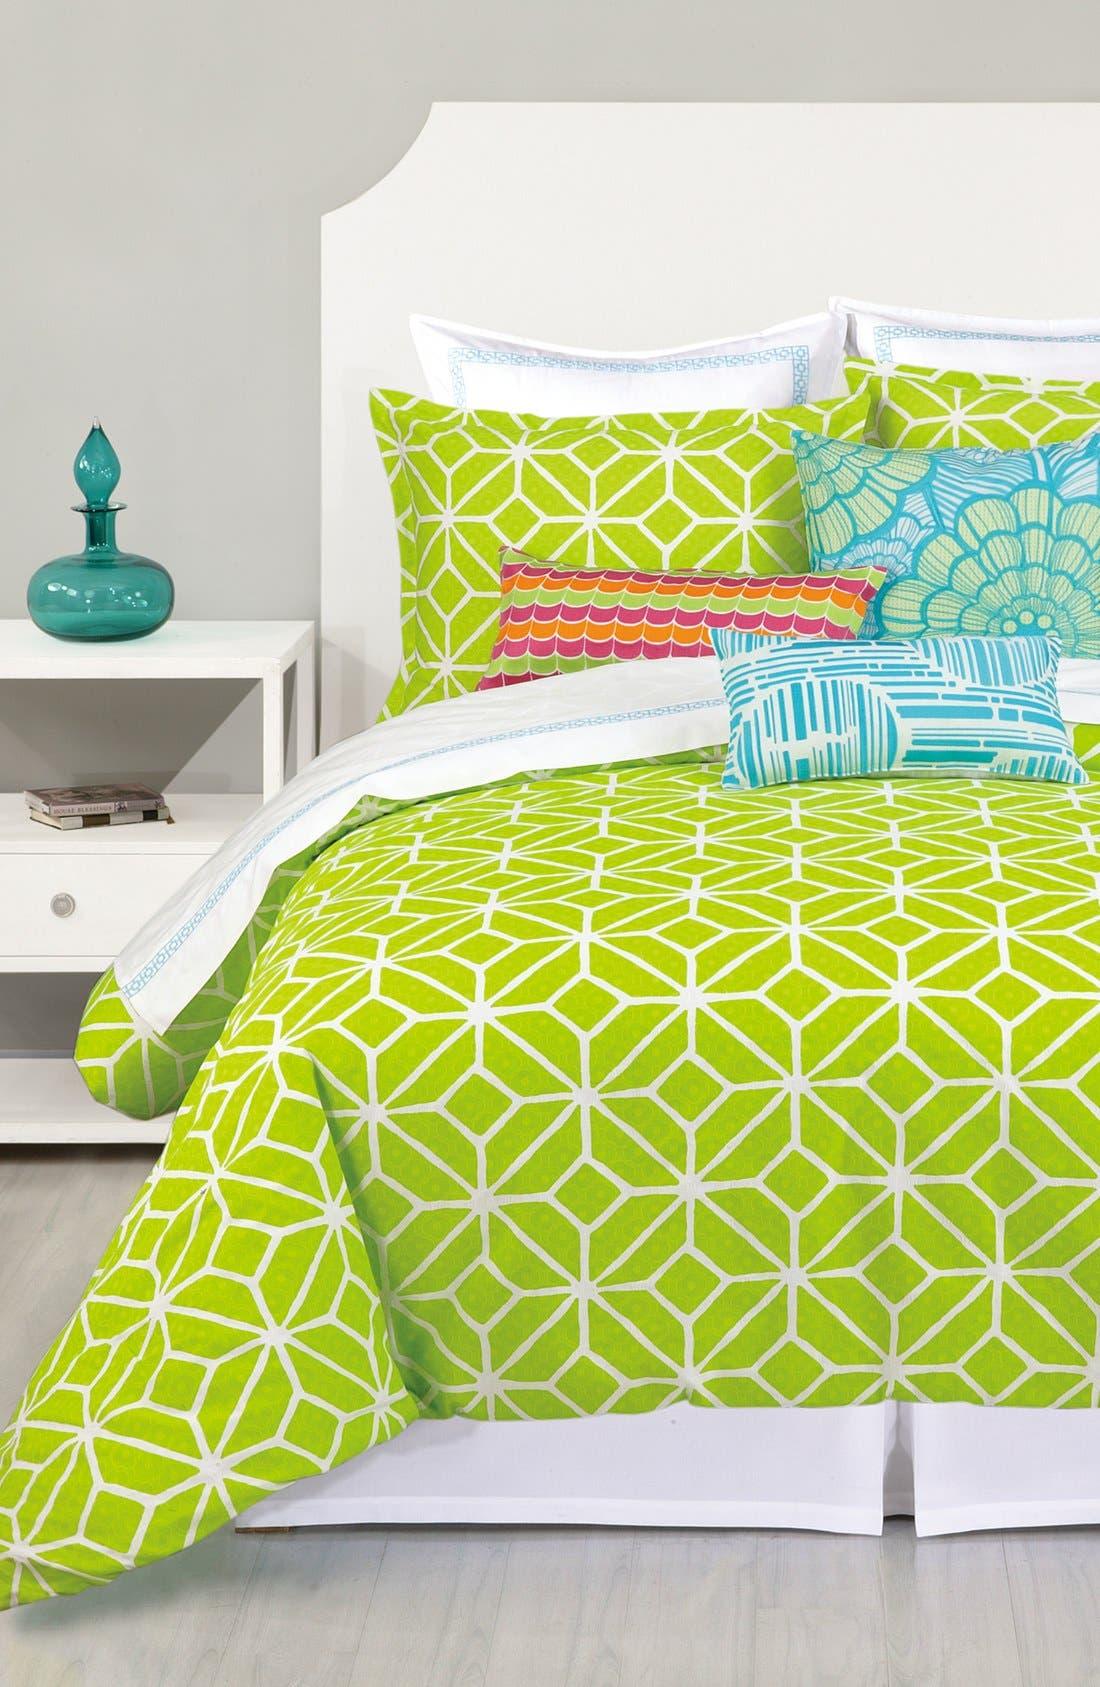 Alternate Image 1 Selected - Trina Turk 'Trellis' 400 Thread Count Comforter & Shams